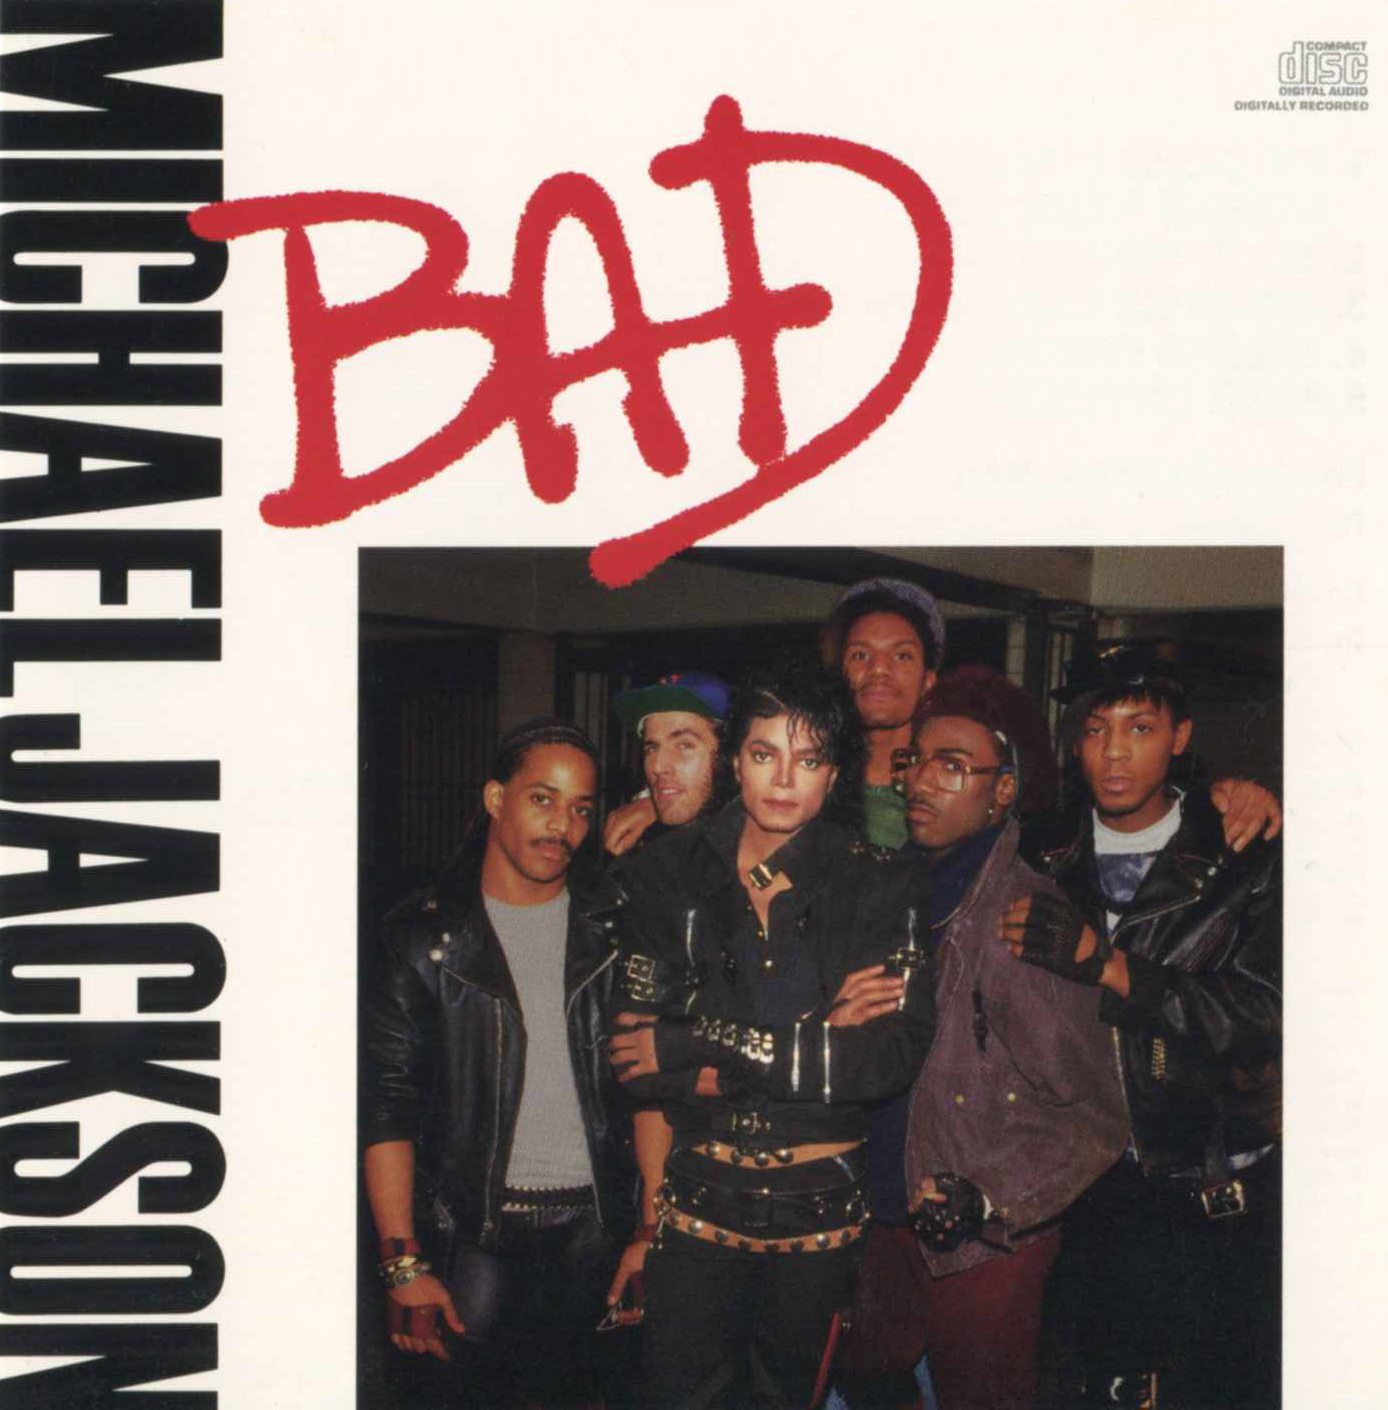 http://1.bp.blogspot.com/-B-UdWmkNVKU/TzXT_-rUt1I/AAAAAAAADVQ/FGhAJnqJESk/s1600/Michael+Jackson+Bad+FRONT.jpg